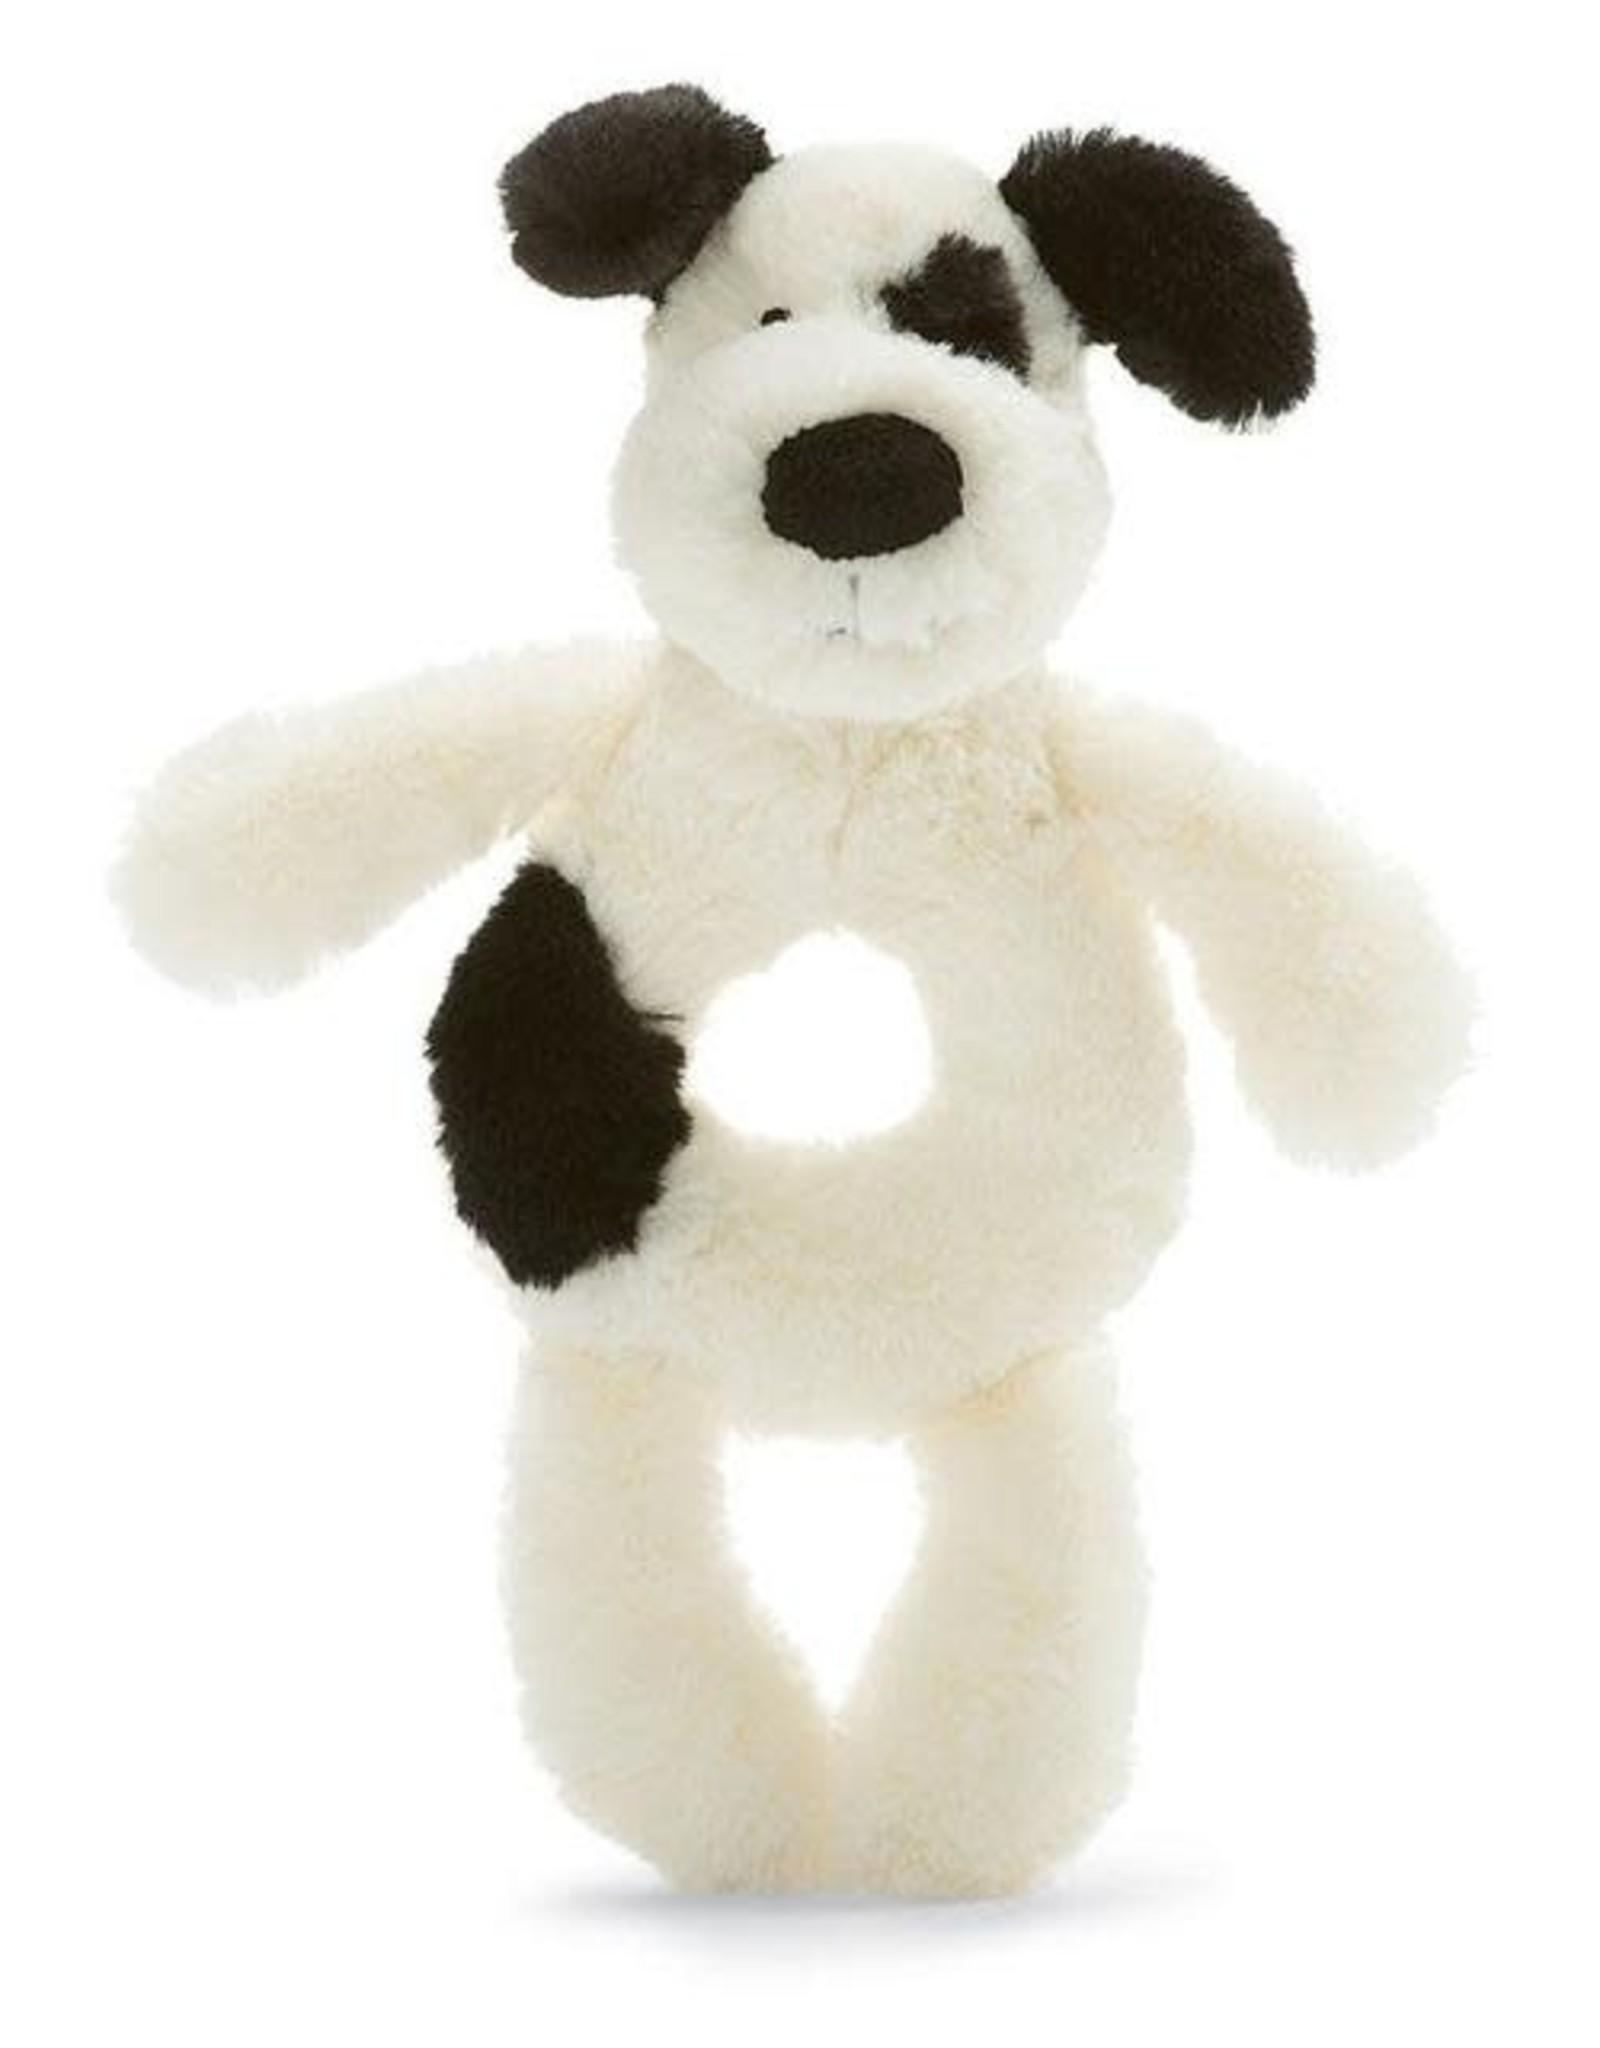 Jellycat Rattle Bashful Black & Cream Puppy Ring